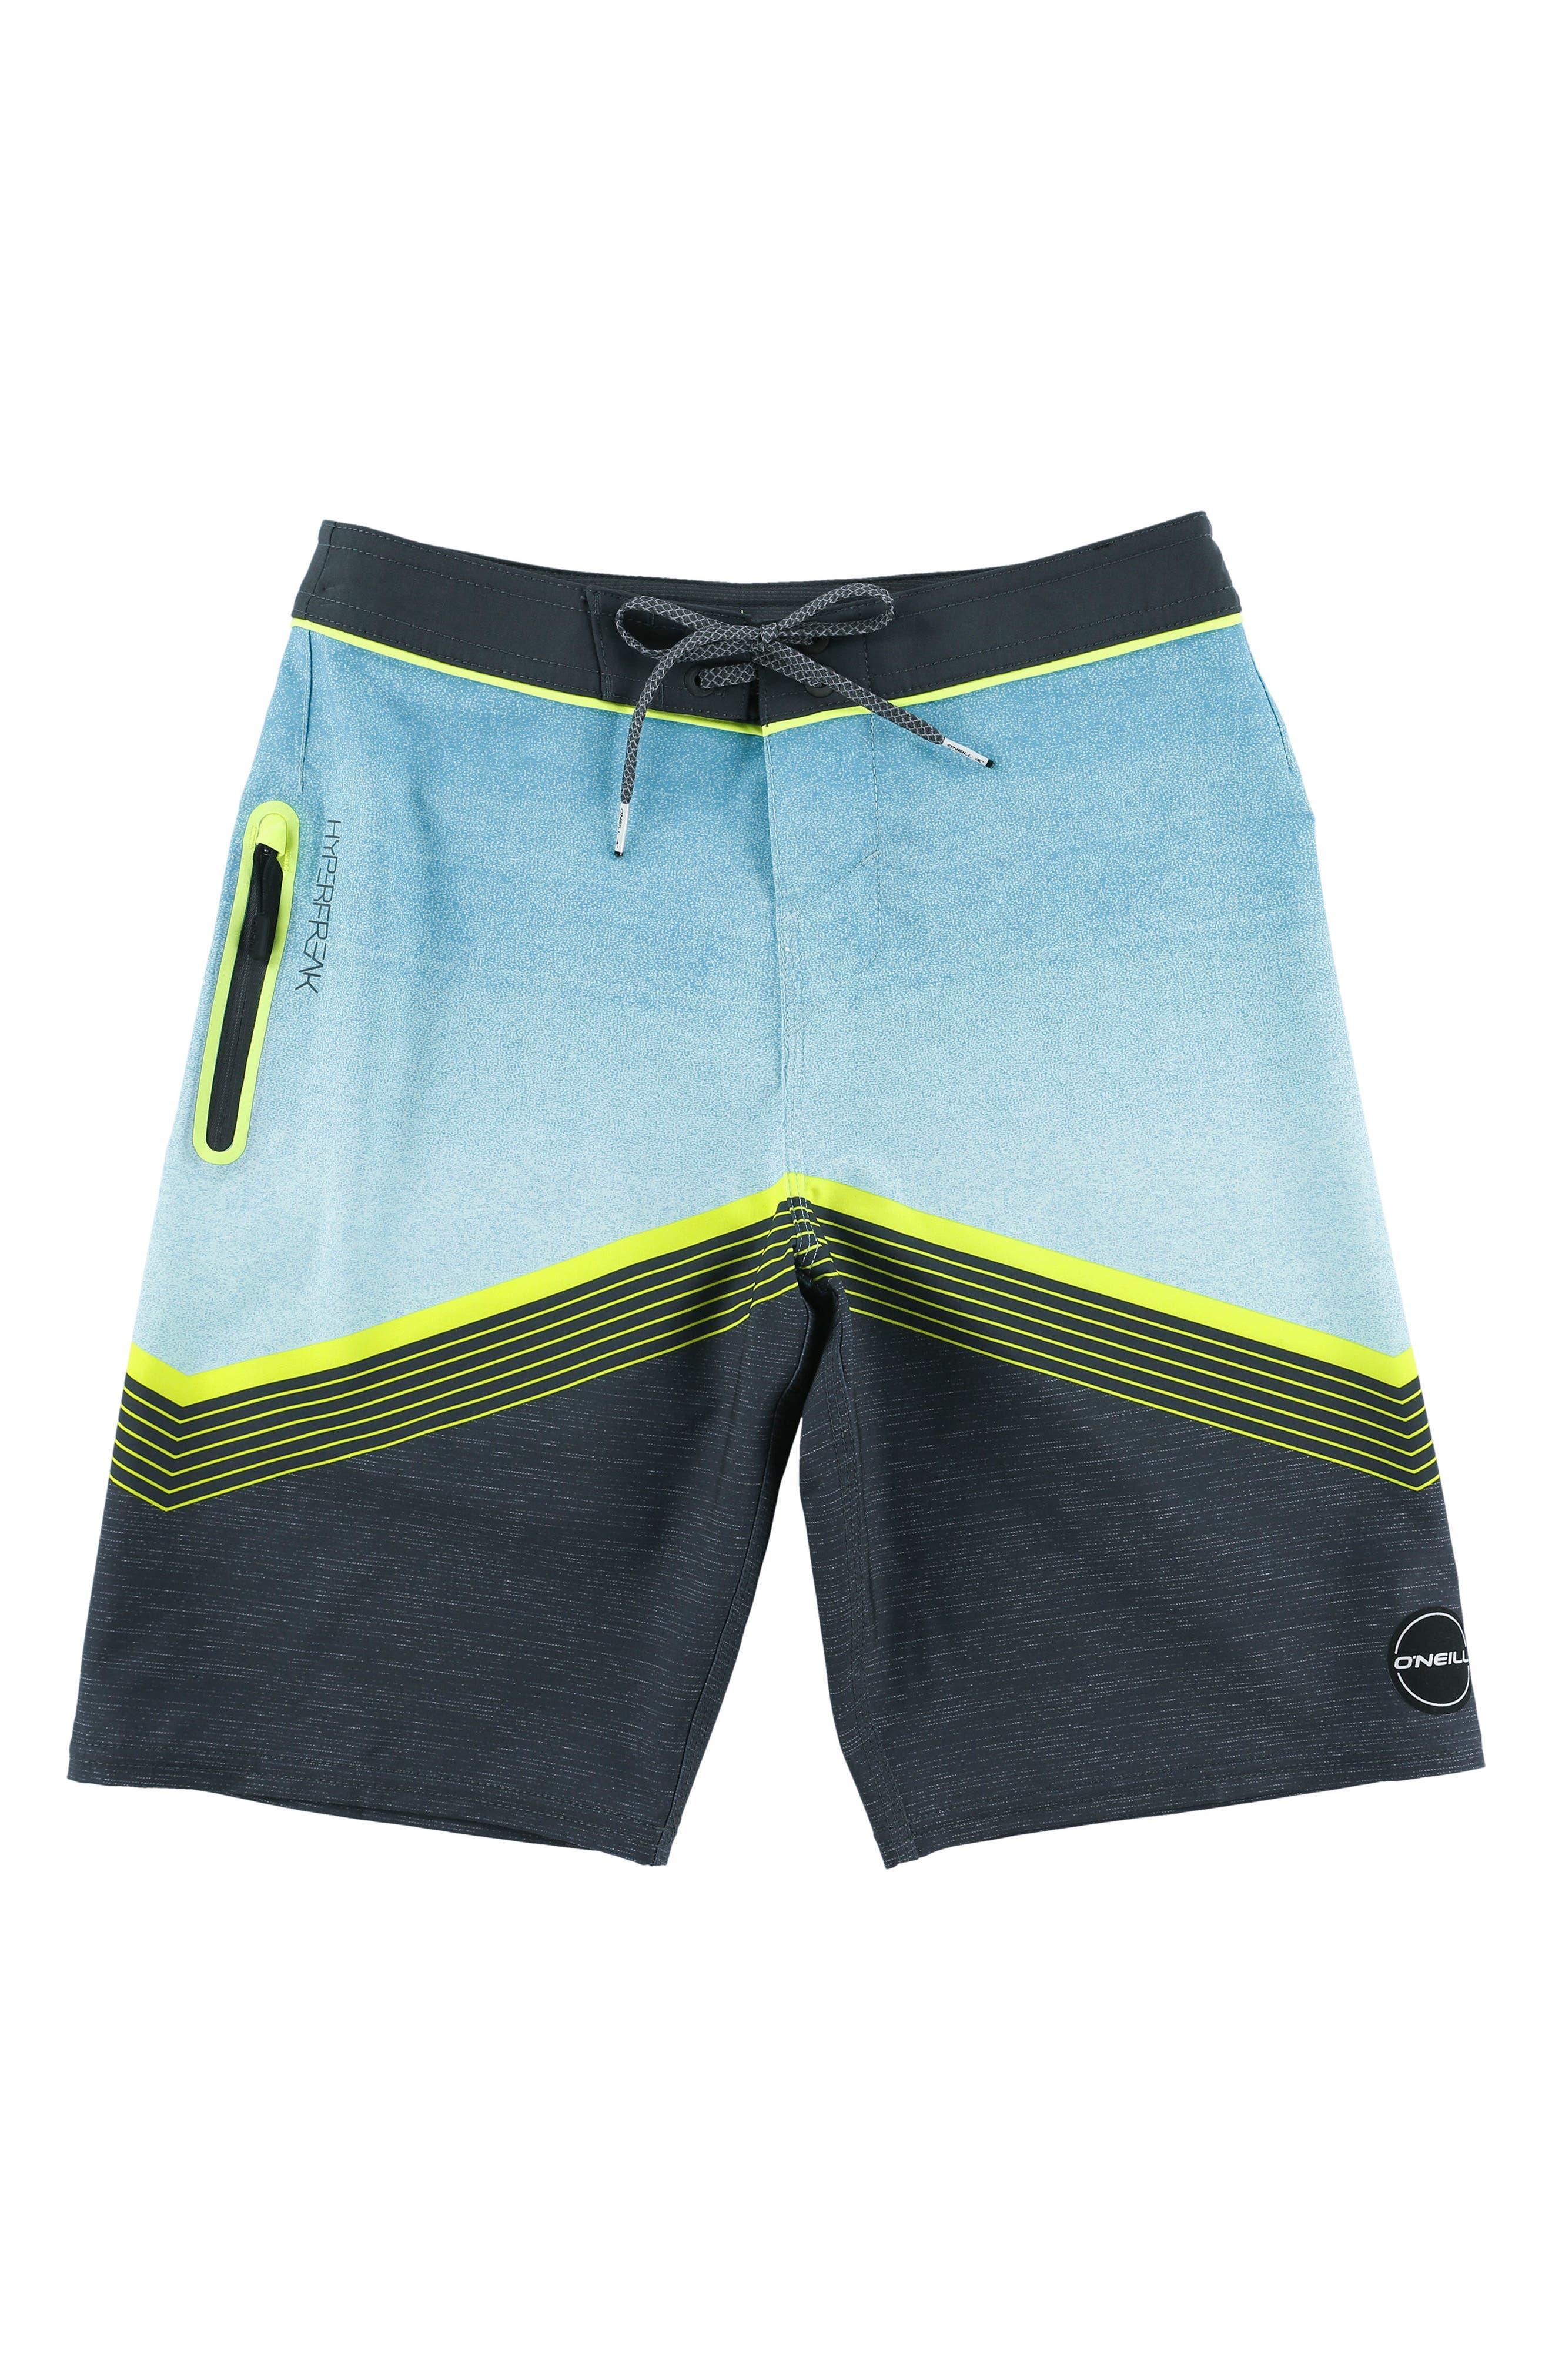 Hyperfreak Stretch Board Shorts,                             Main thumbnail 7, color,